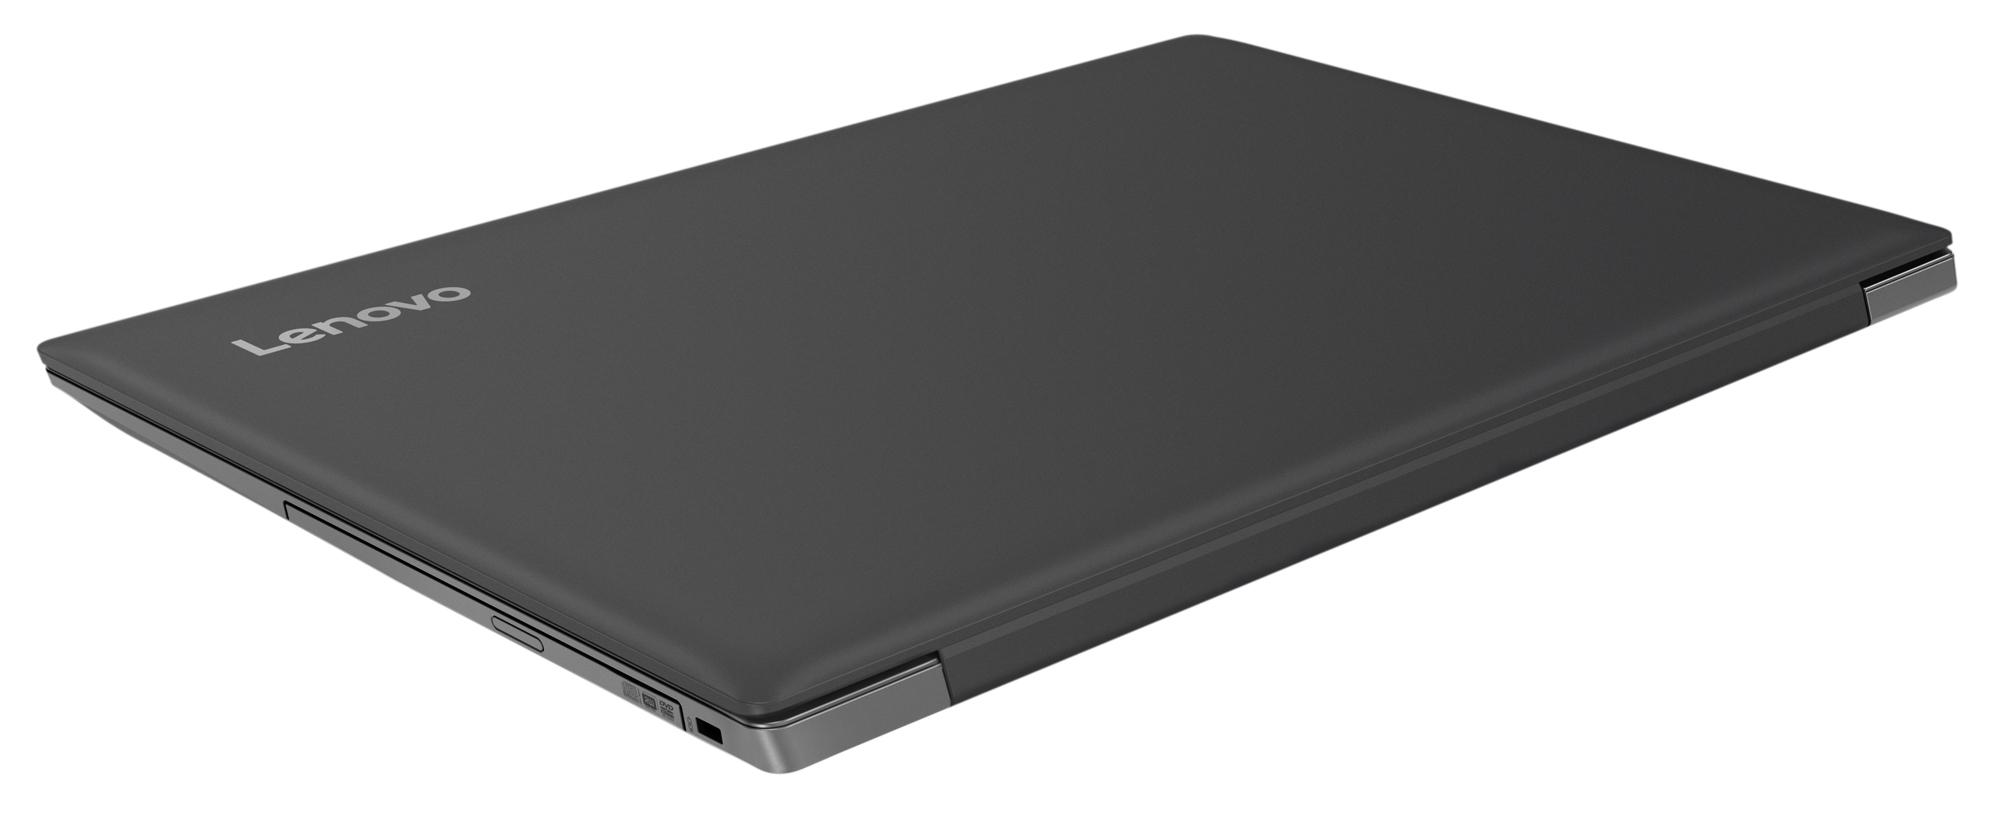 Фото  Ноутбук Lenovo ideapad 330-15 Onyx Black (81D2009QRA)